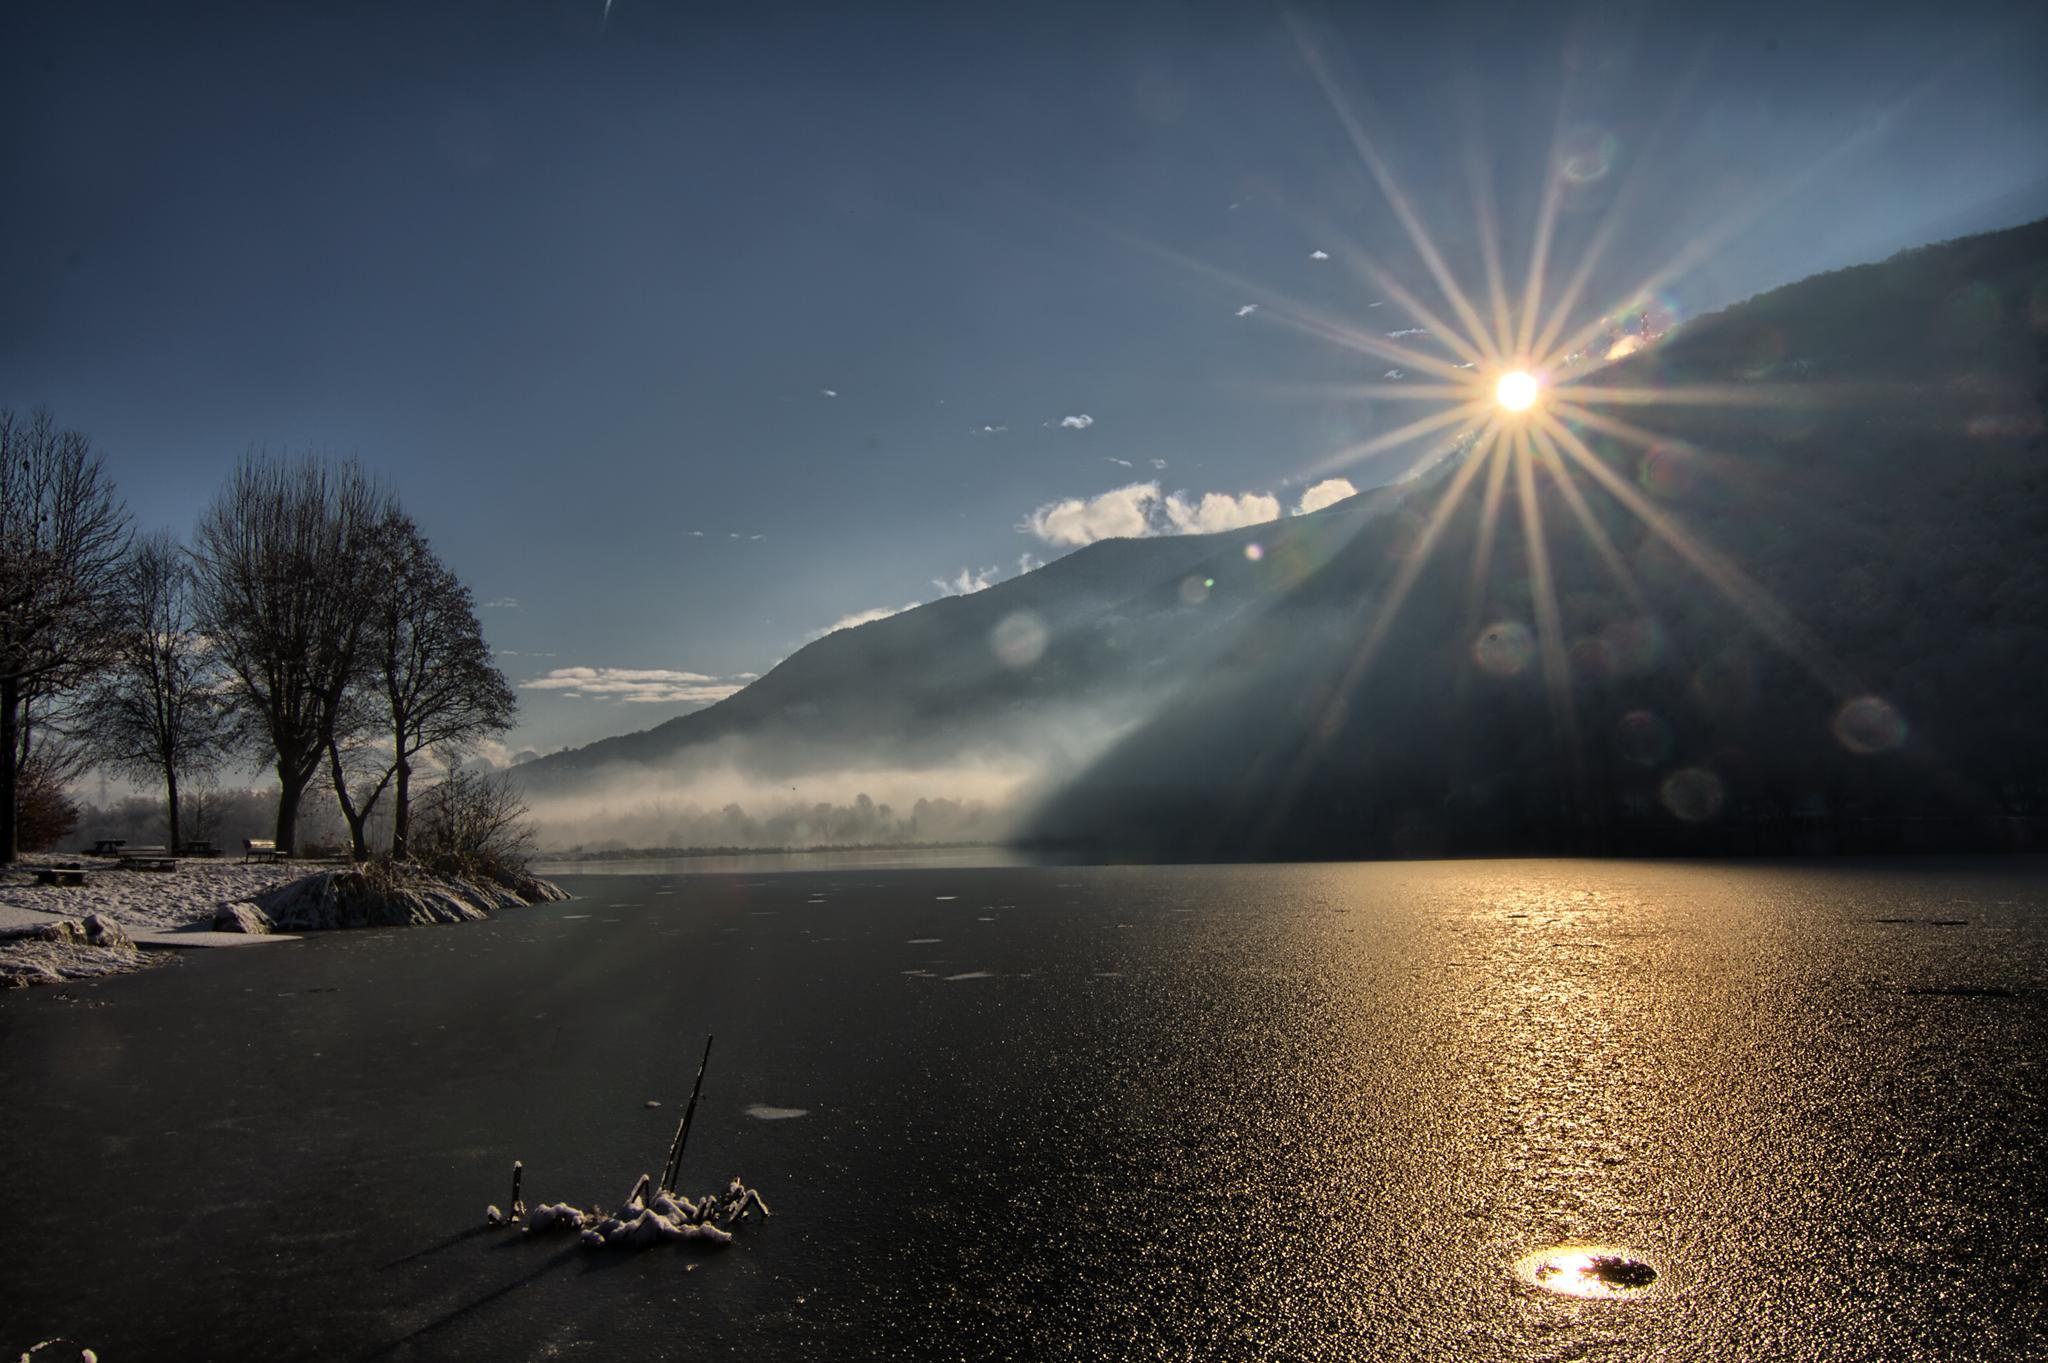 Endine Lake, Italy